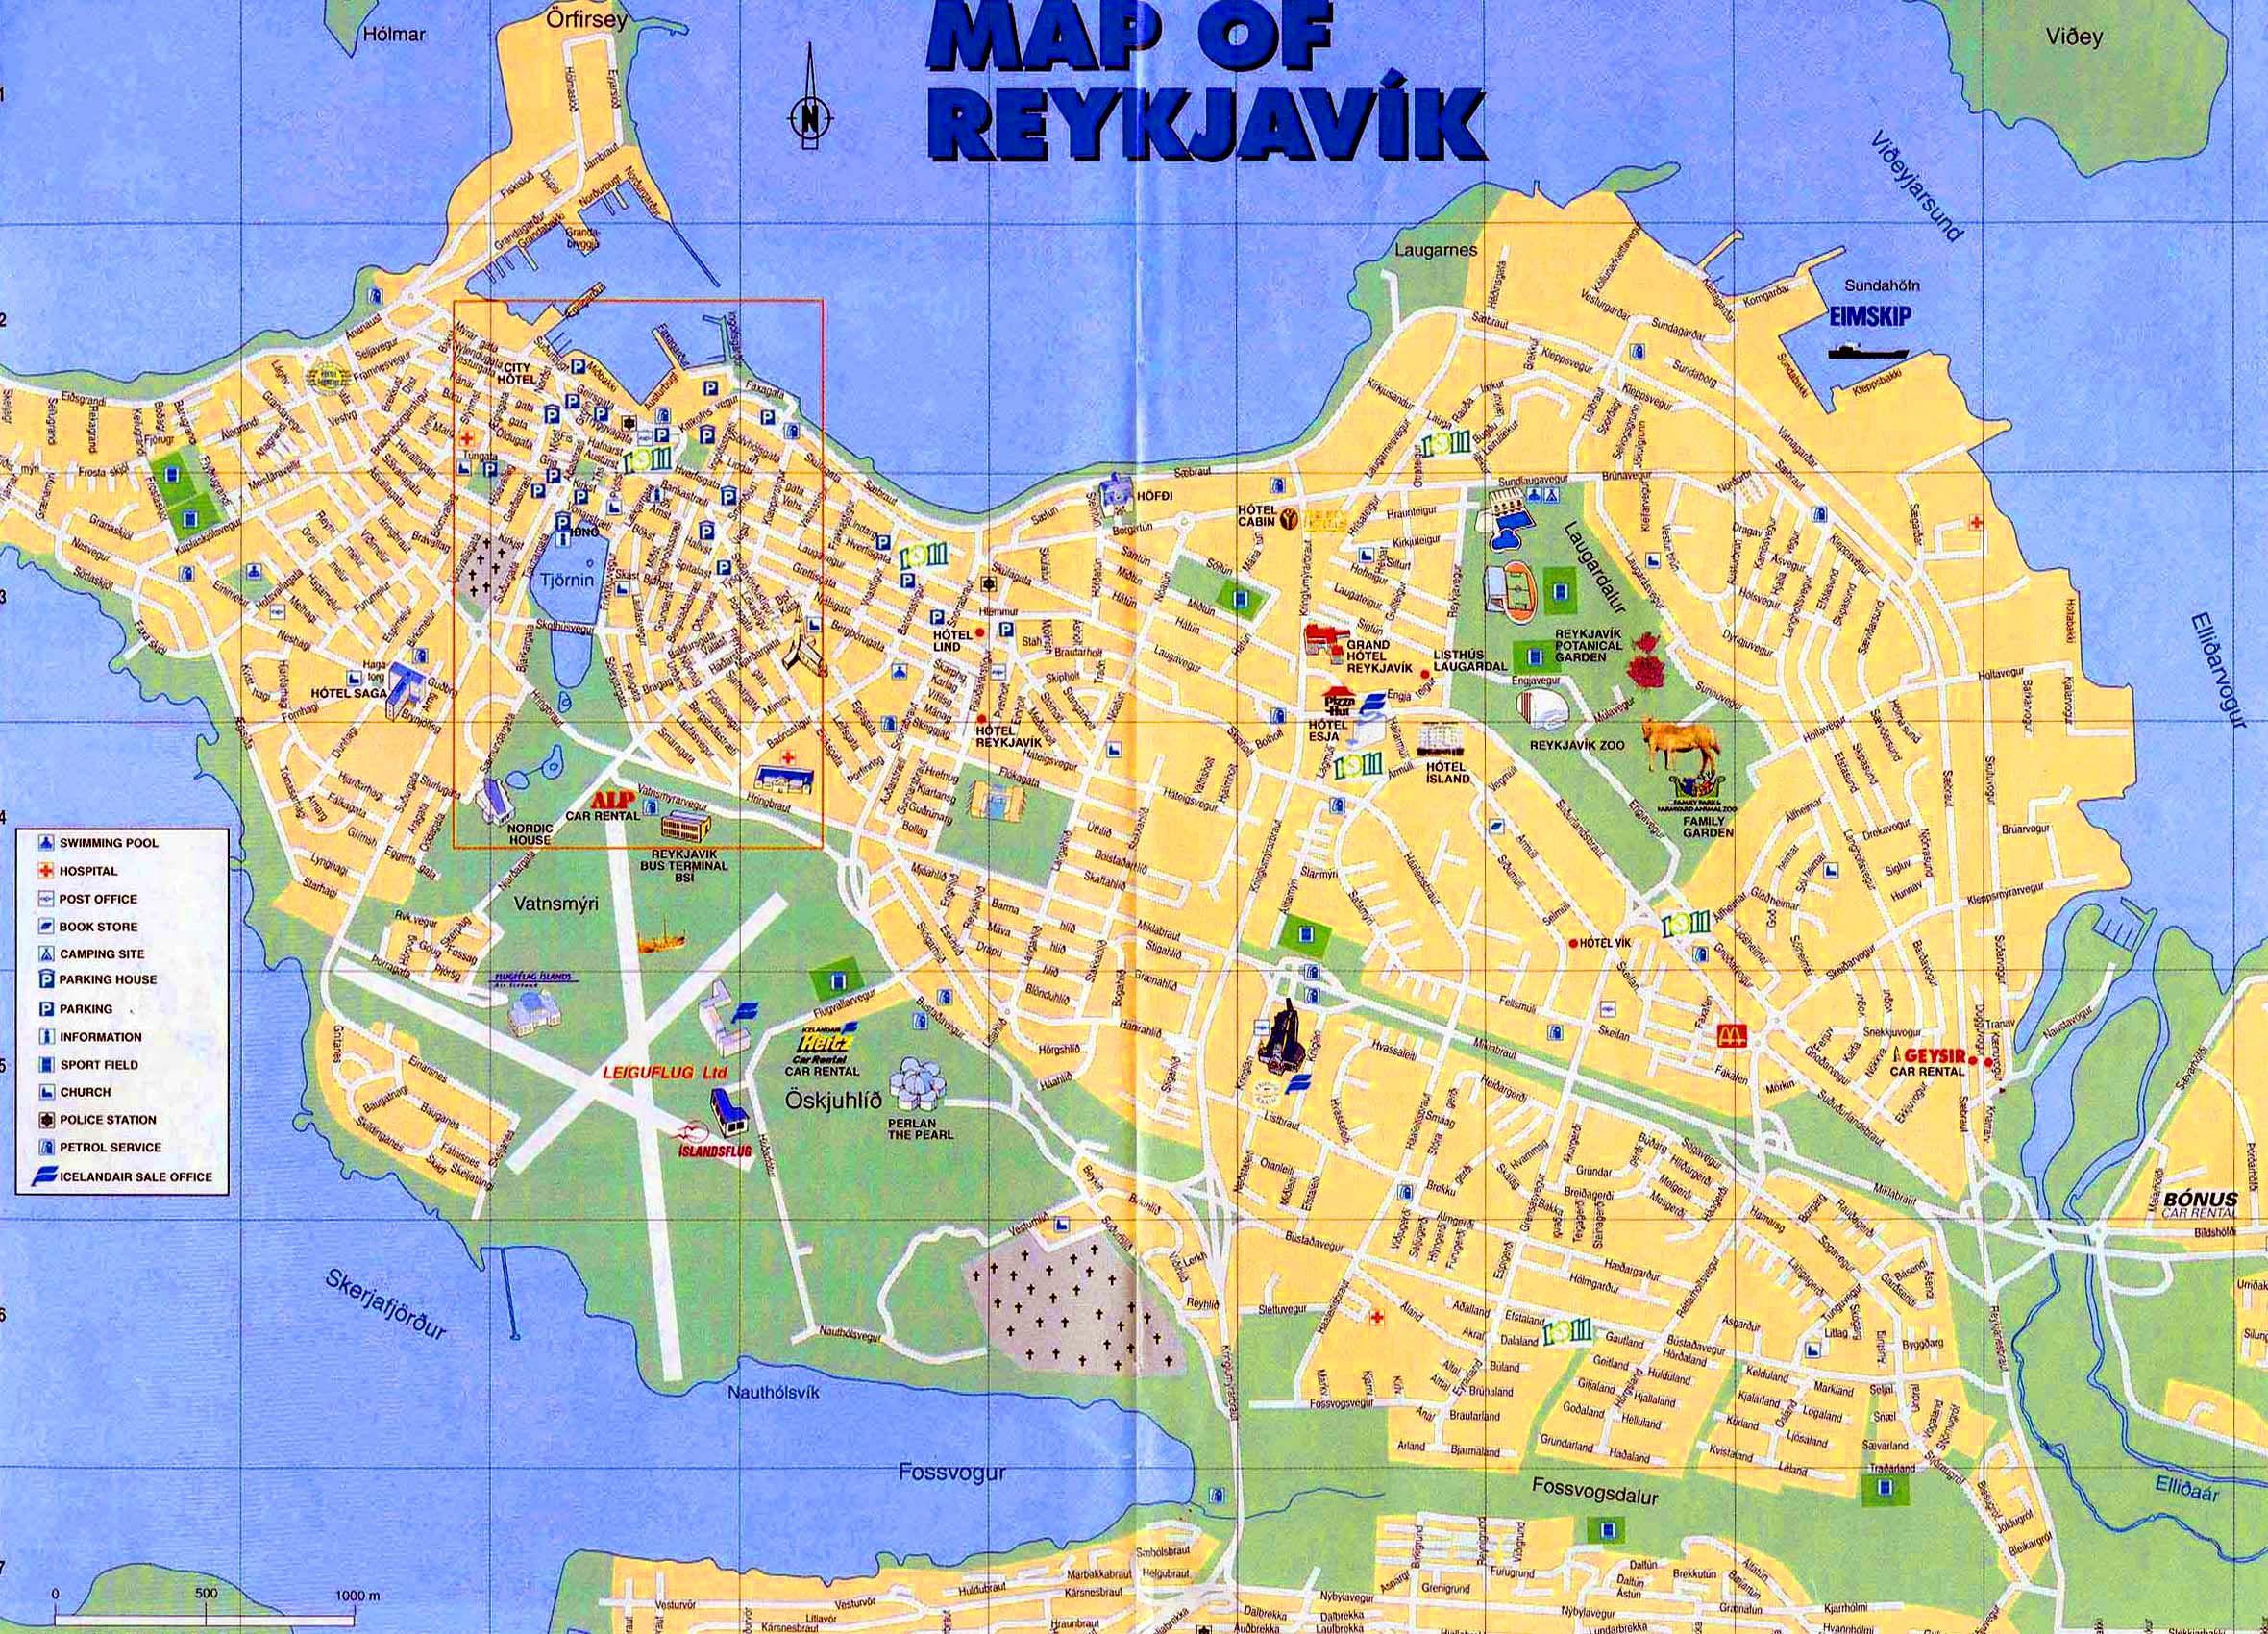 High-resolution map of Reykjavik for print or download | Reykjavik on us virgin islands aerial map, dubai aerial map, antarctic aerial map, guam aerial map, australia aerial map, france aerial map, cayman islands aerial map, aruba aerial map, singapore aerial map, dominican republic aerial map, great wall of china aerial map,